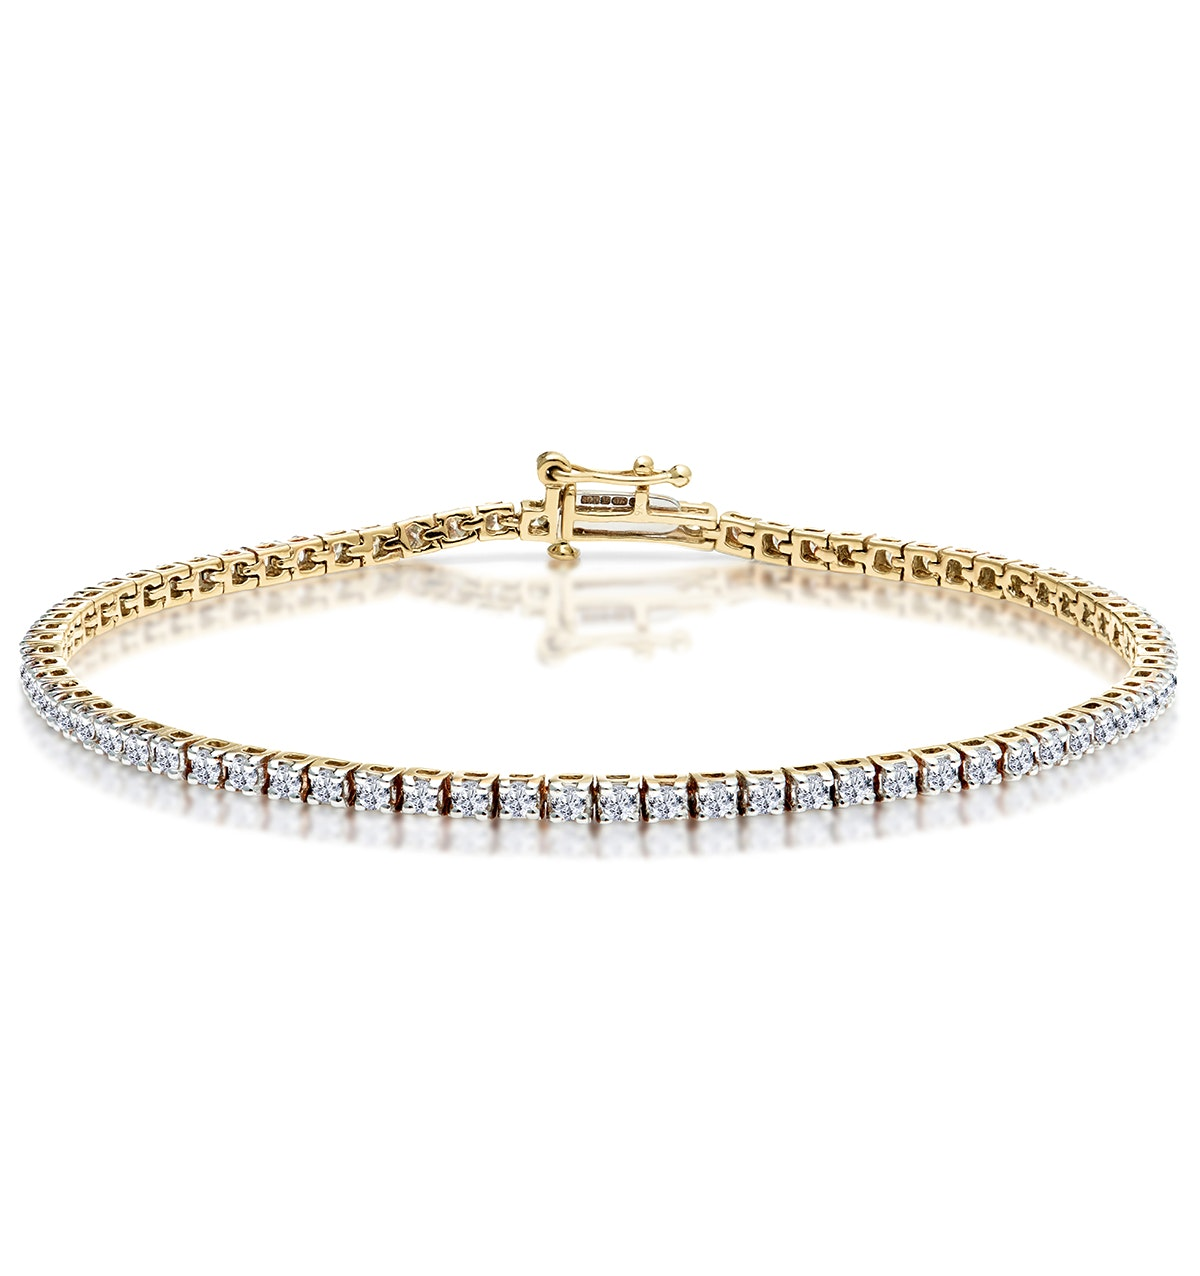 2ct Diamond Tennis Bracelet Claw Set in 9K Yellow Gold